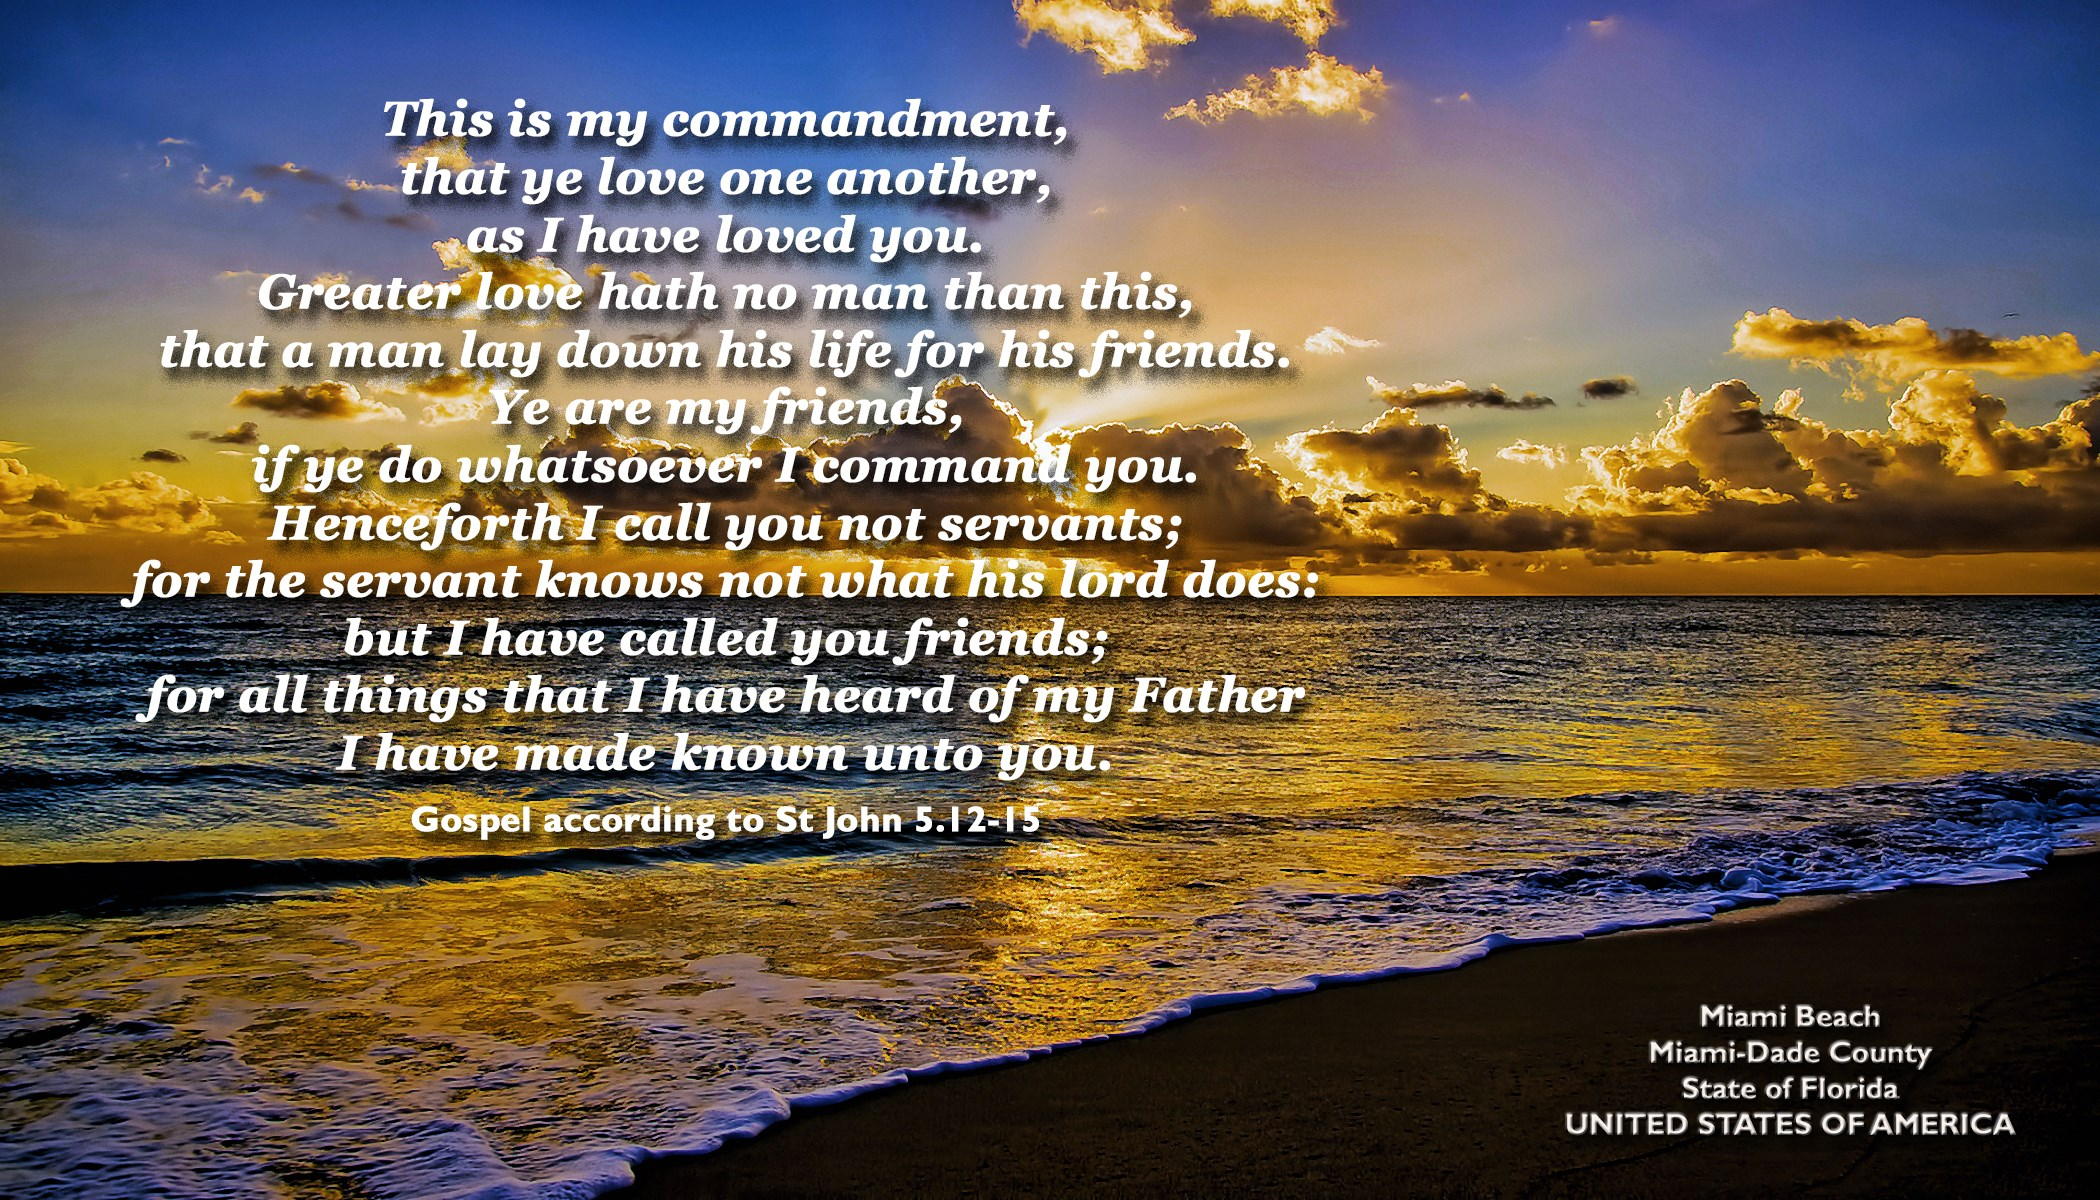 00-this-is-my-commandment-miami-beach-fl-usa-sunrise-030217